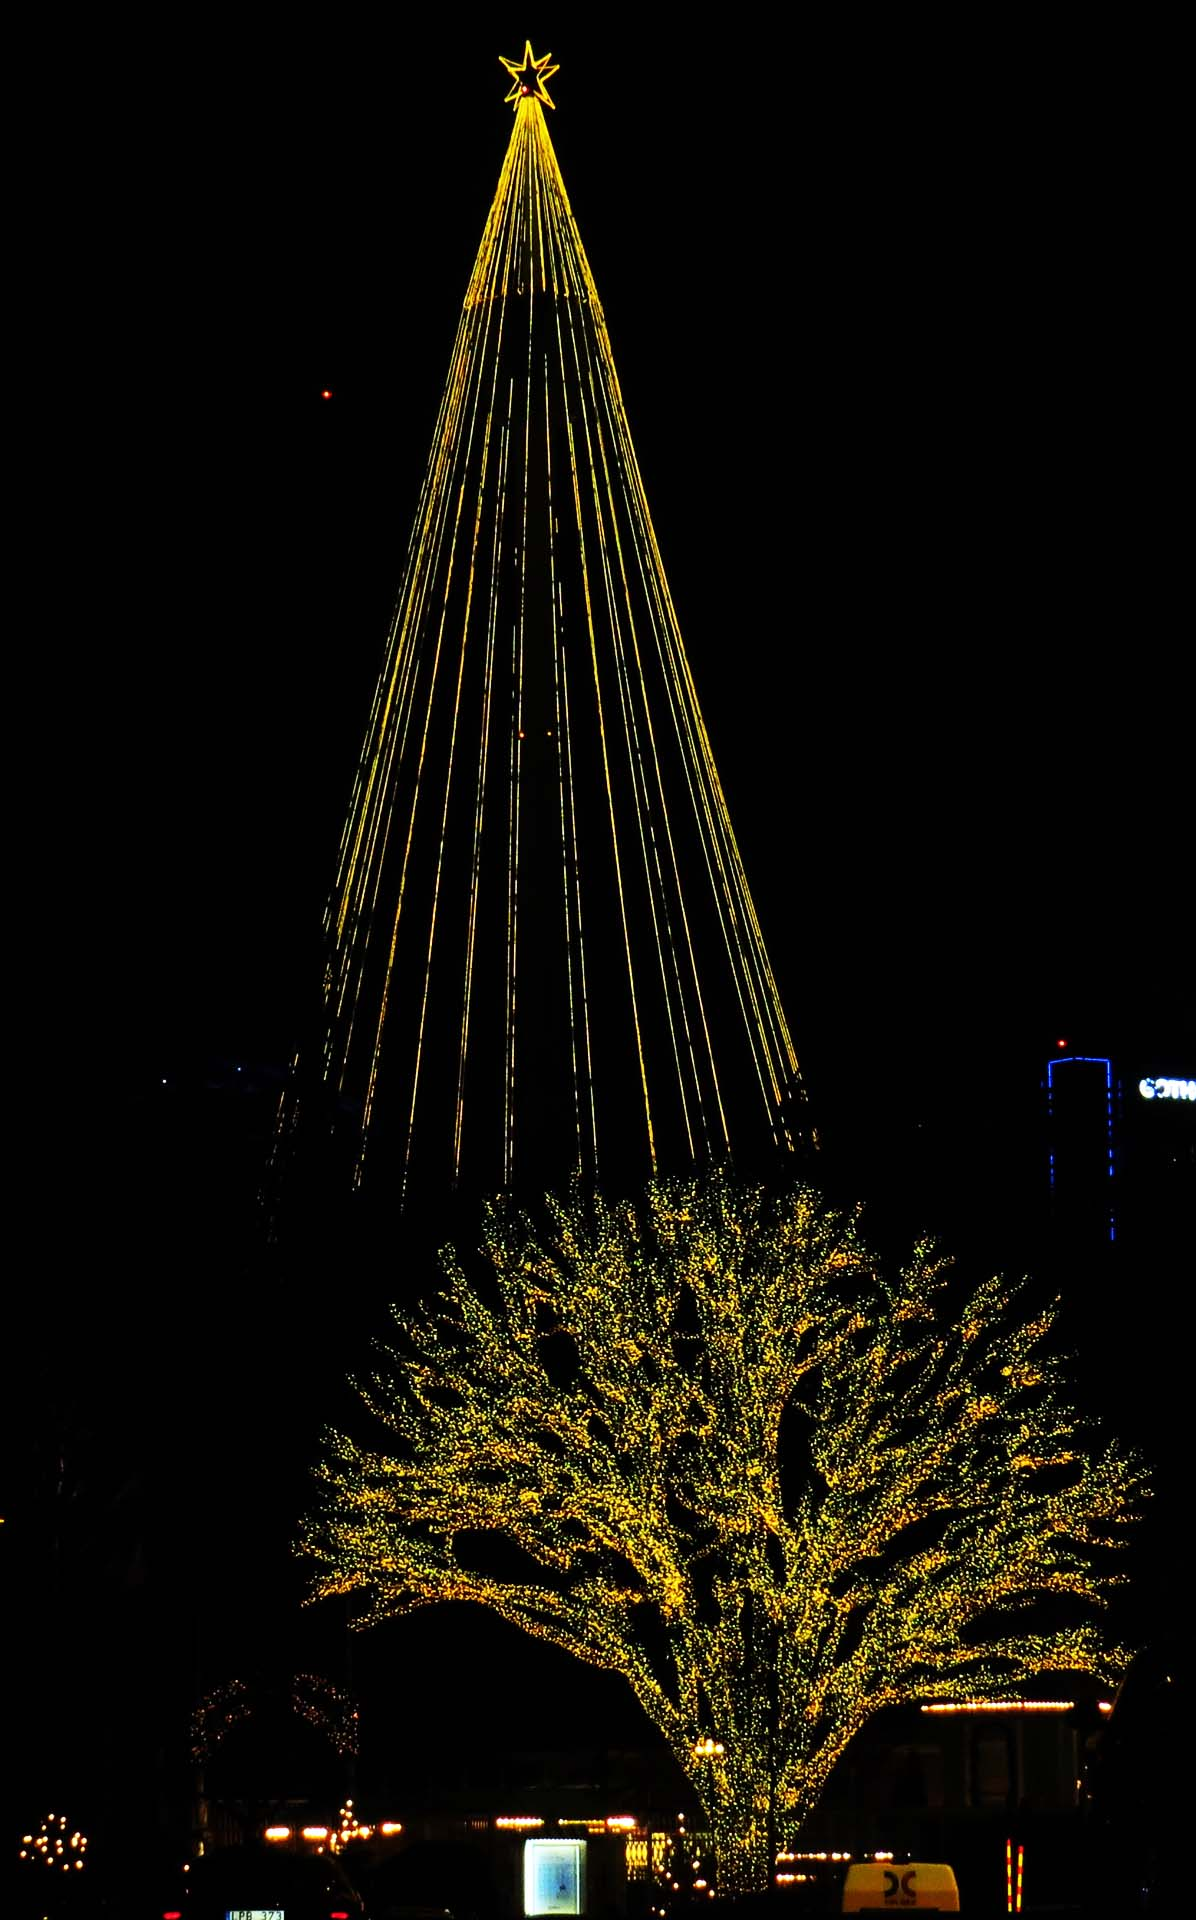 Tree all alight and Liseberg Christmas star